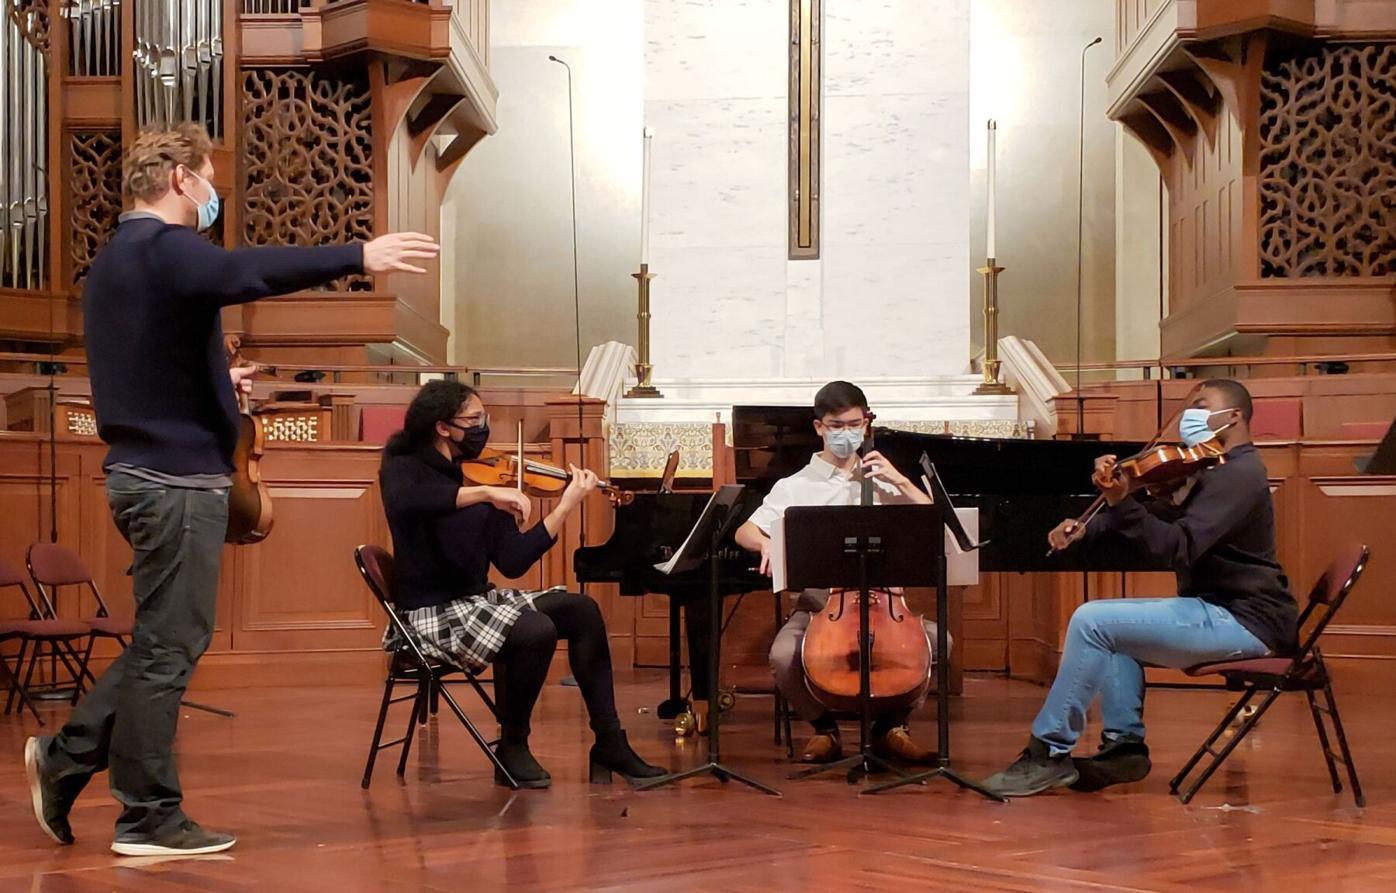 042821_MNS_concert_series_001 David Coucheron with student musicians